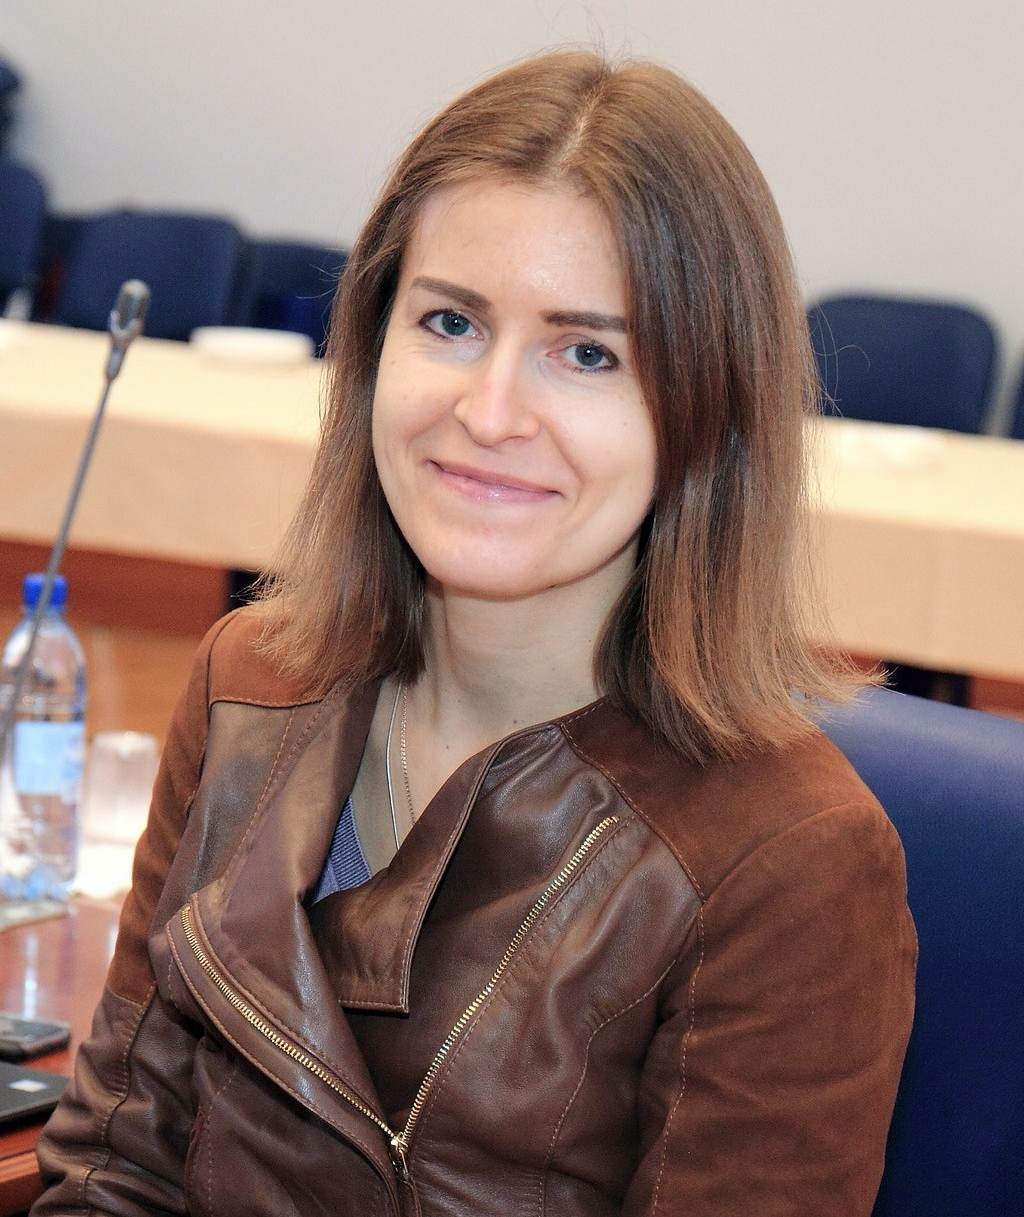 Liliana Proskuryakova